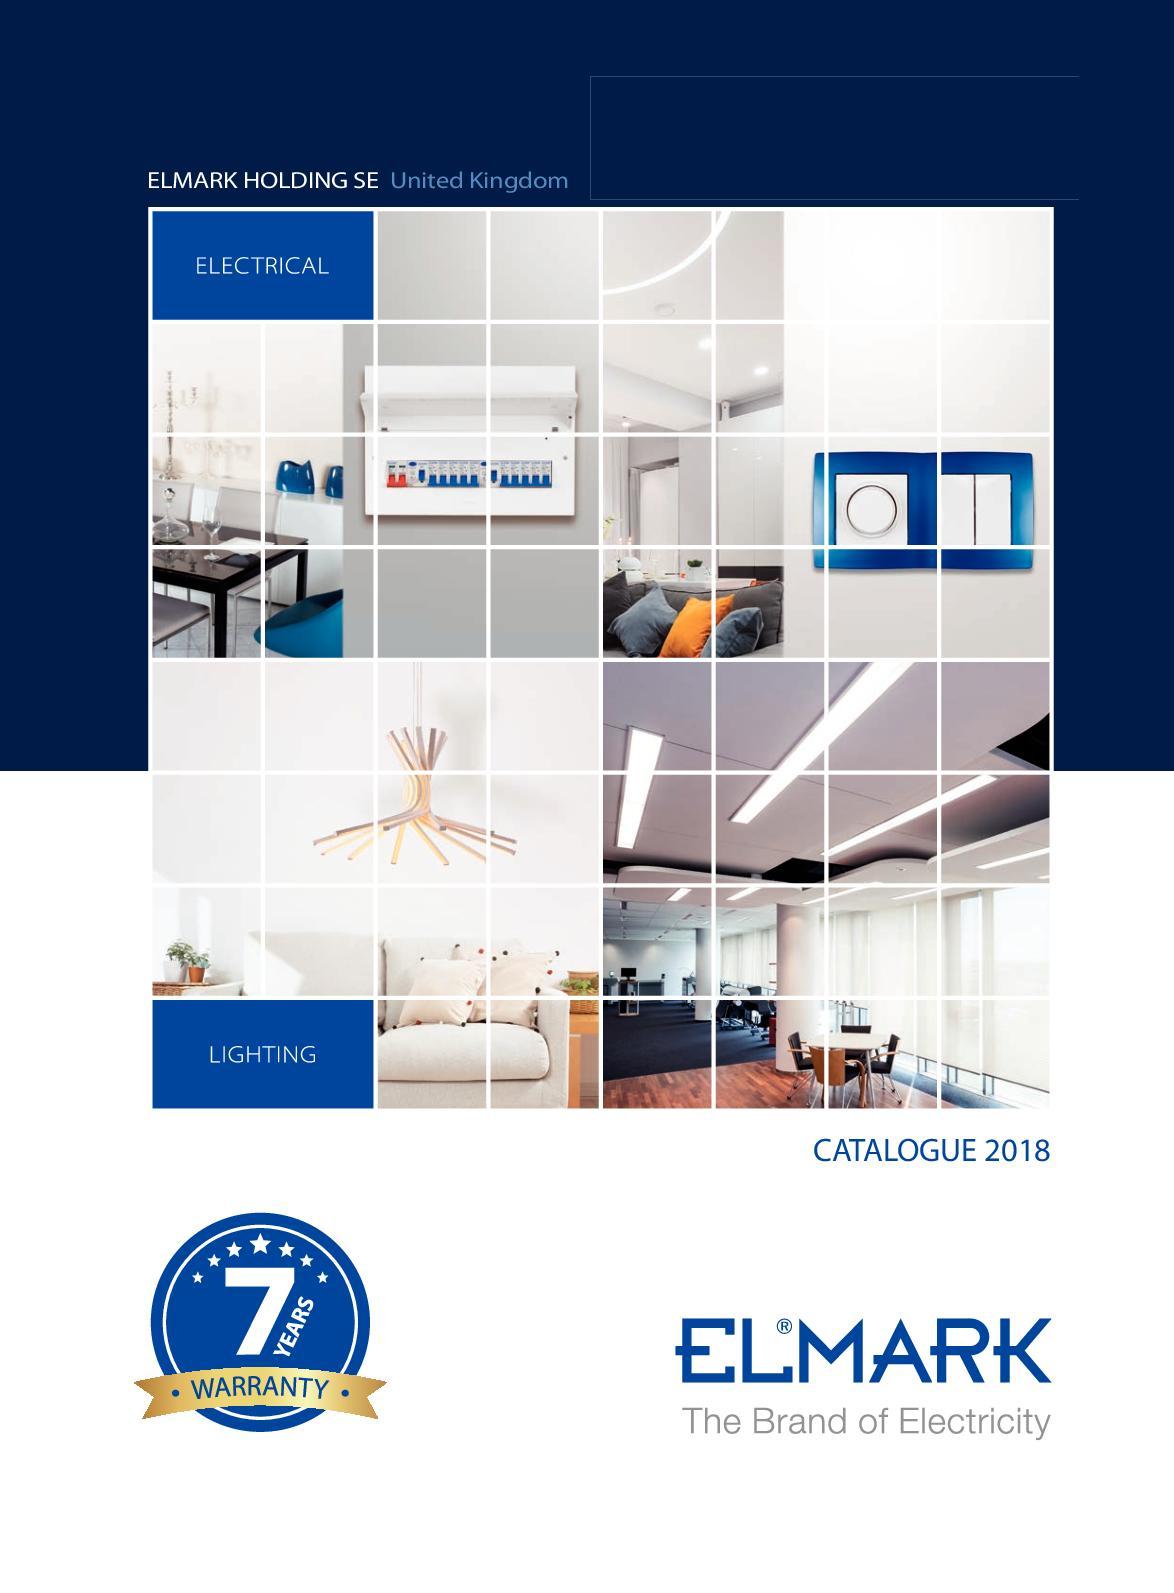 Calamo Elmark Ersram Katalgus Precision Photoelectric Switch Wiring Diagram T15